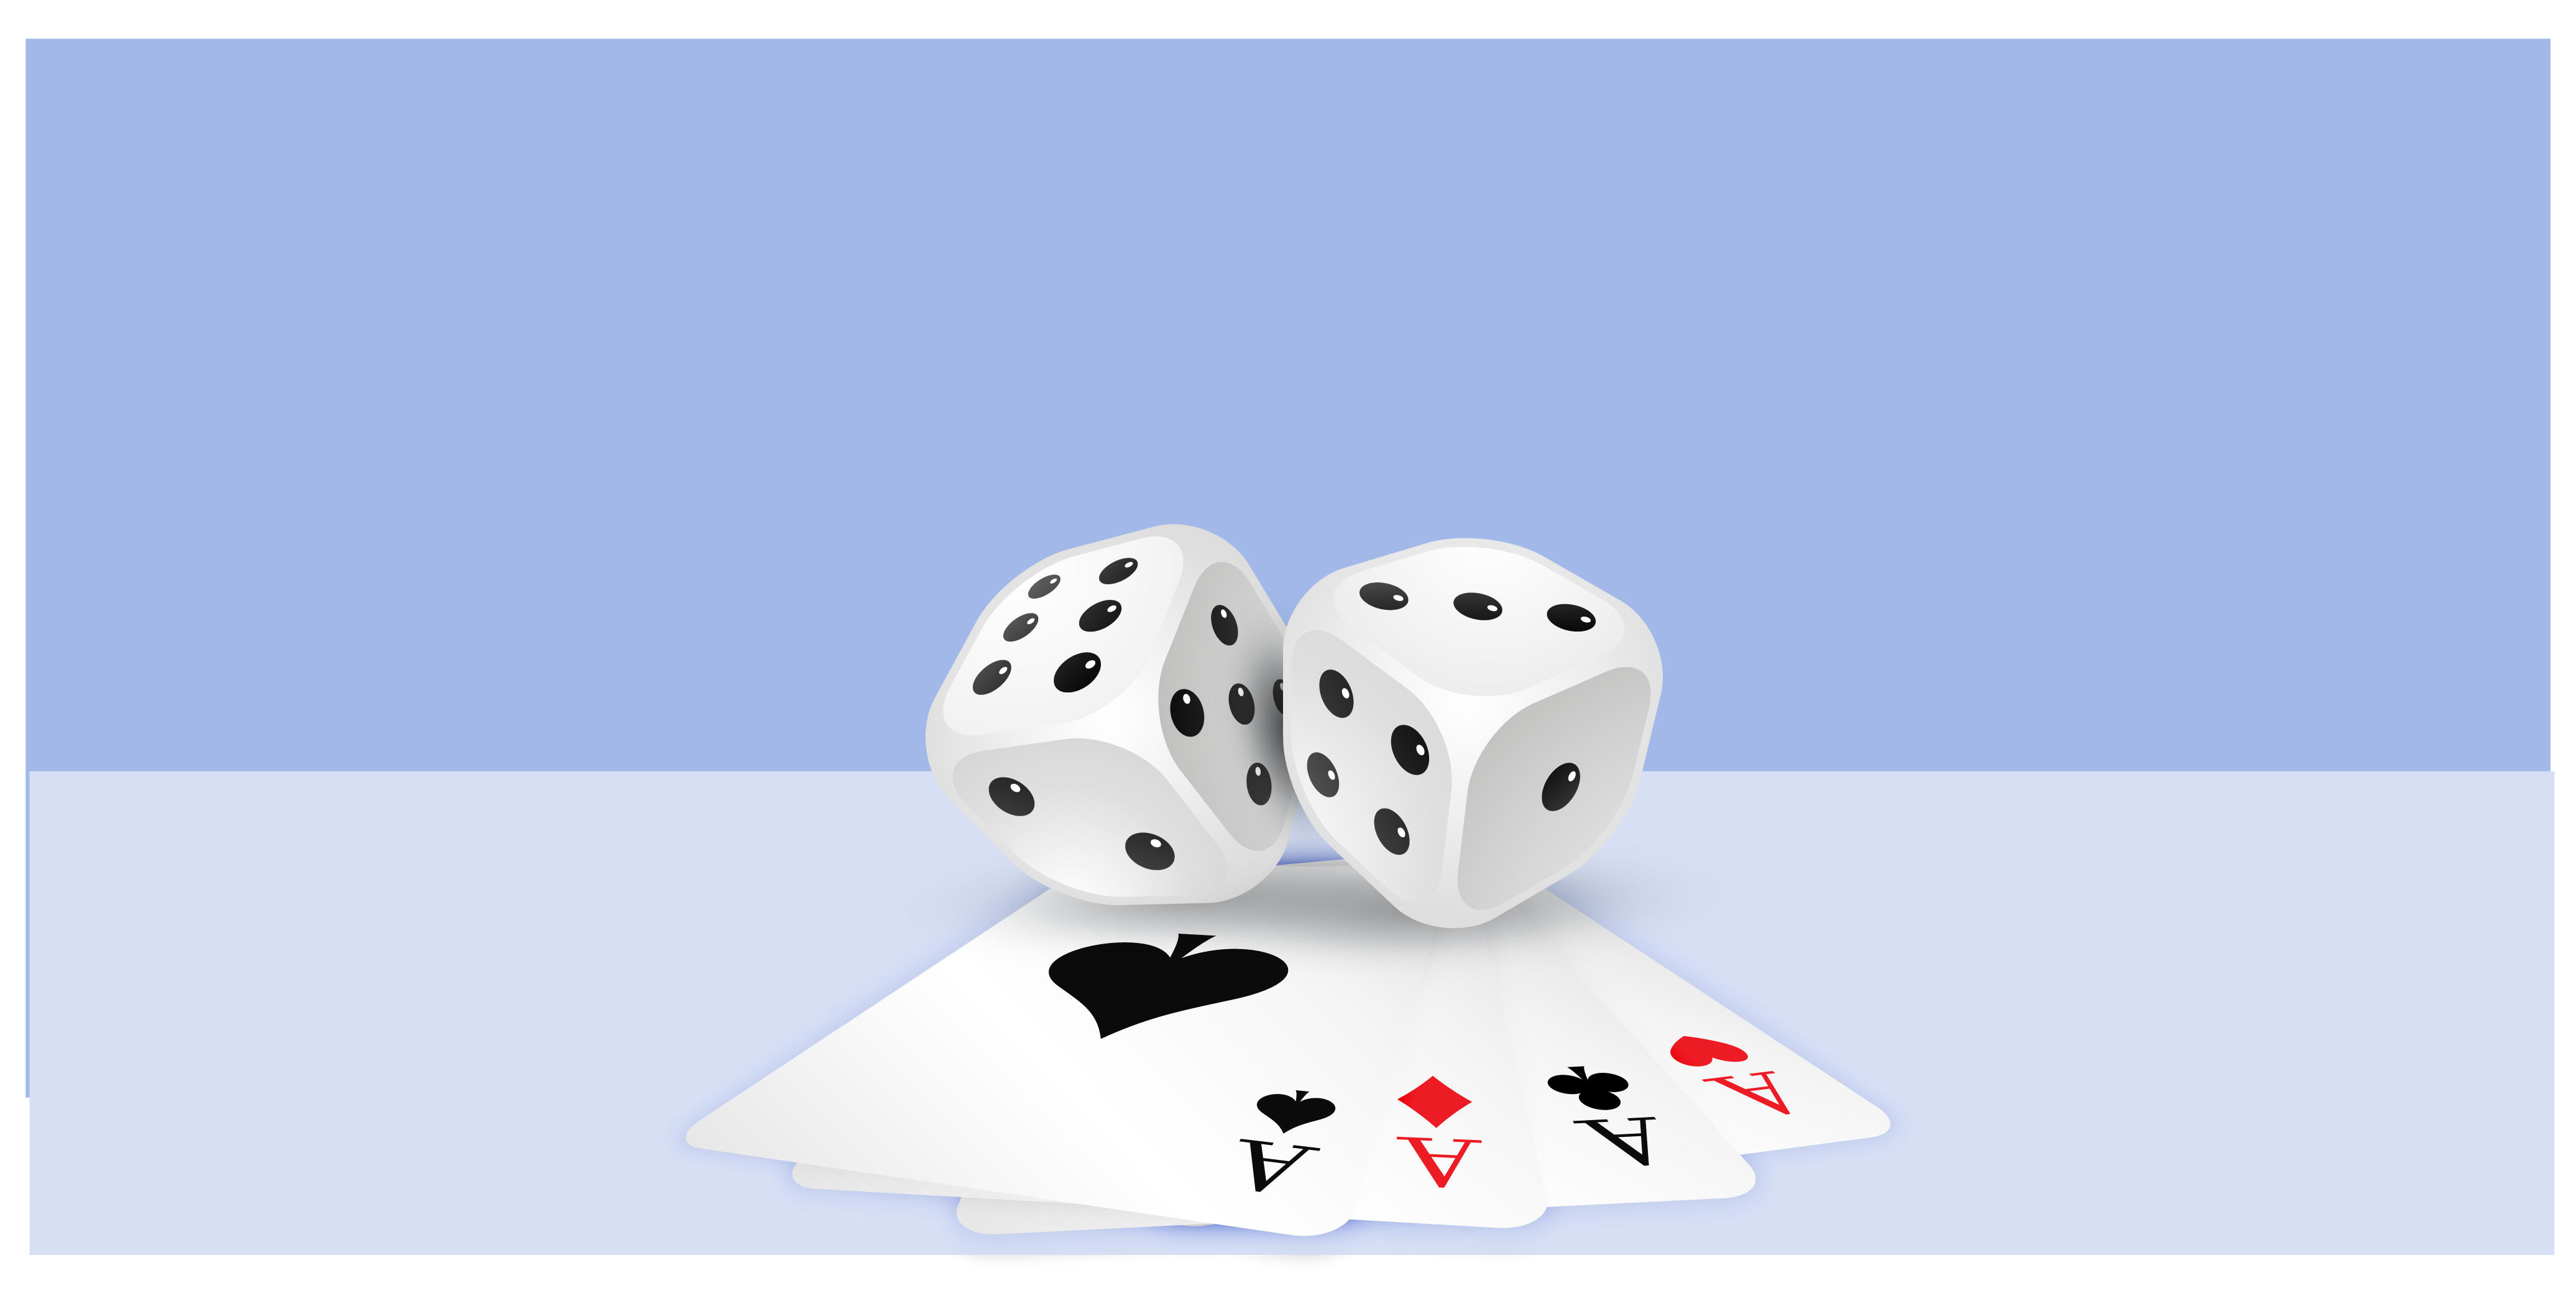 Blog-Illustrations_Keeping-Gambling-in-Check.png